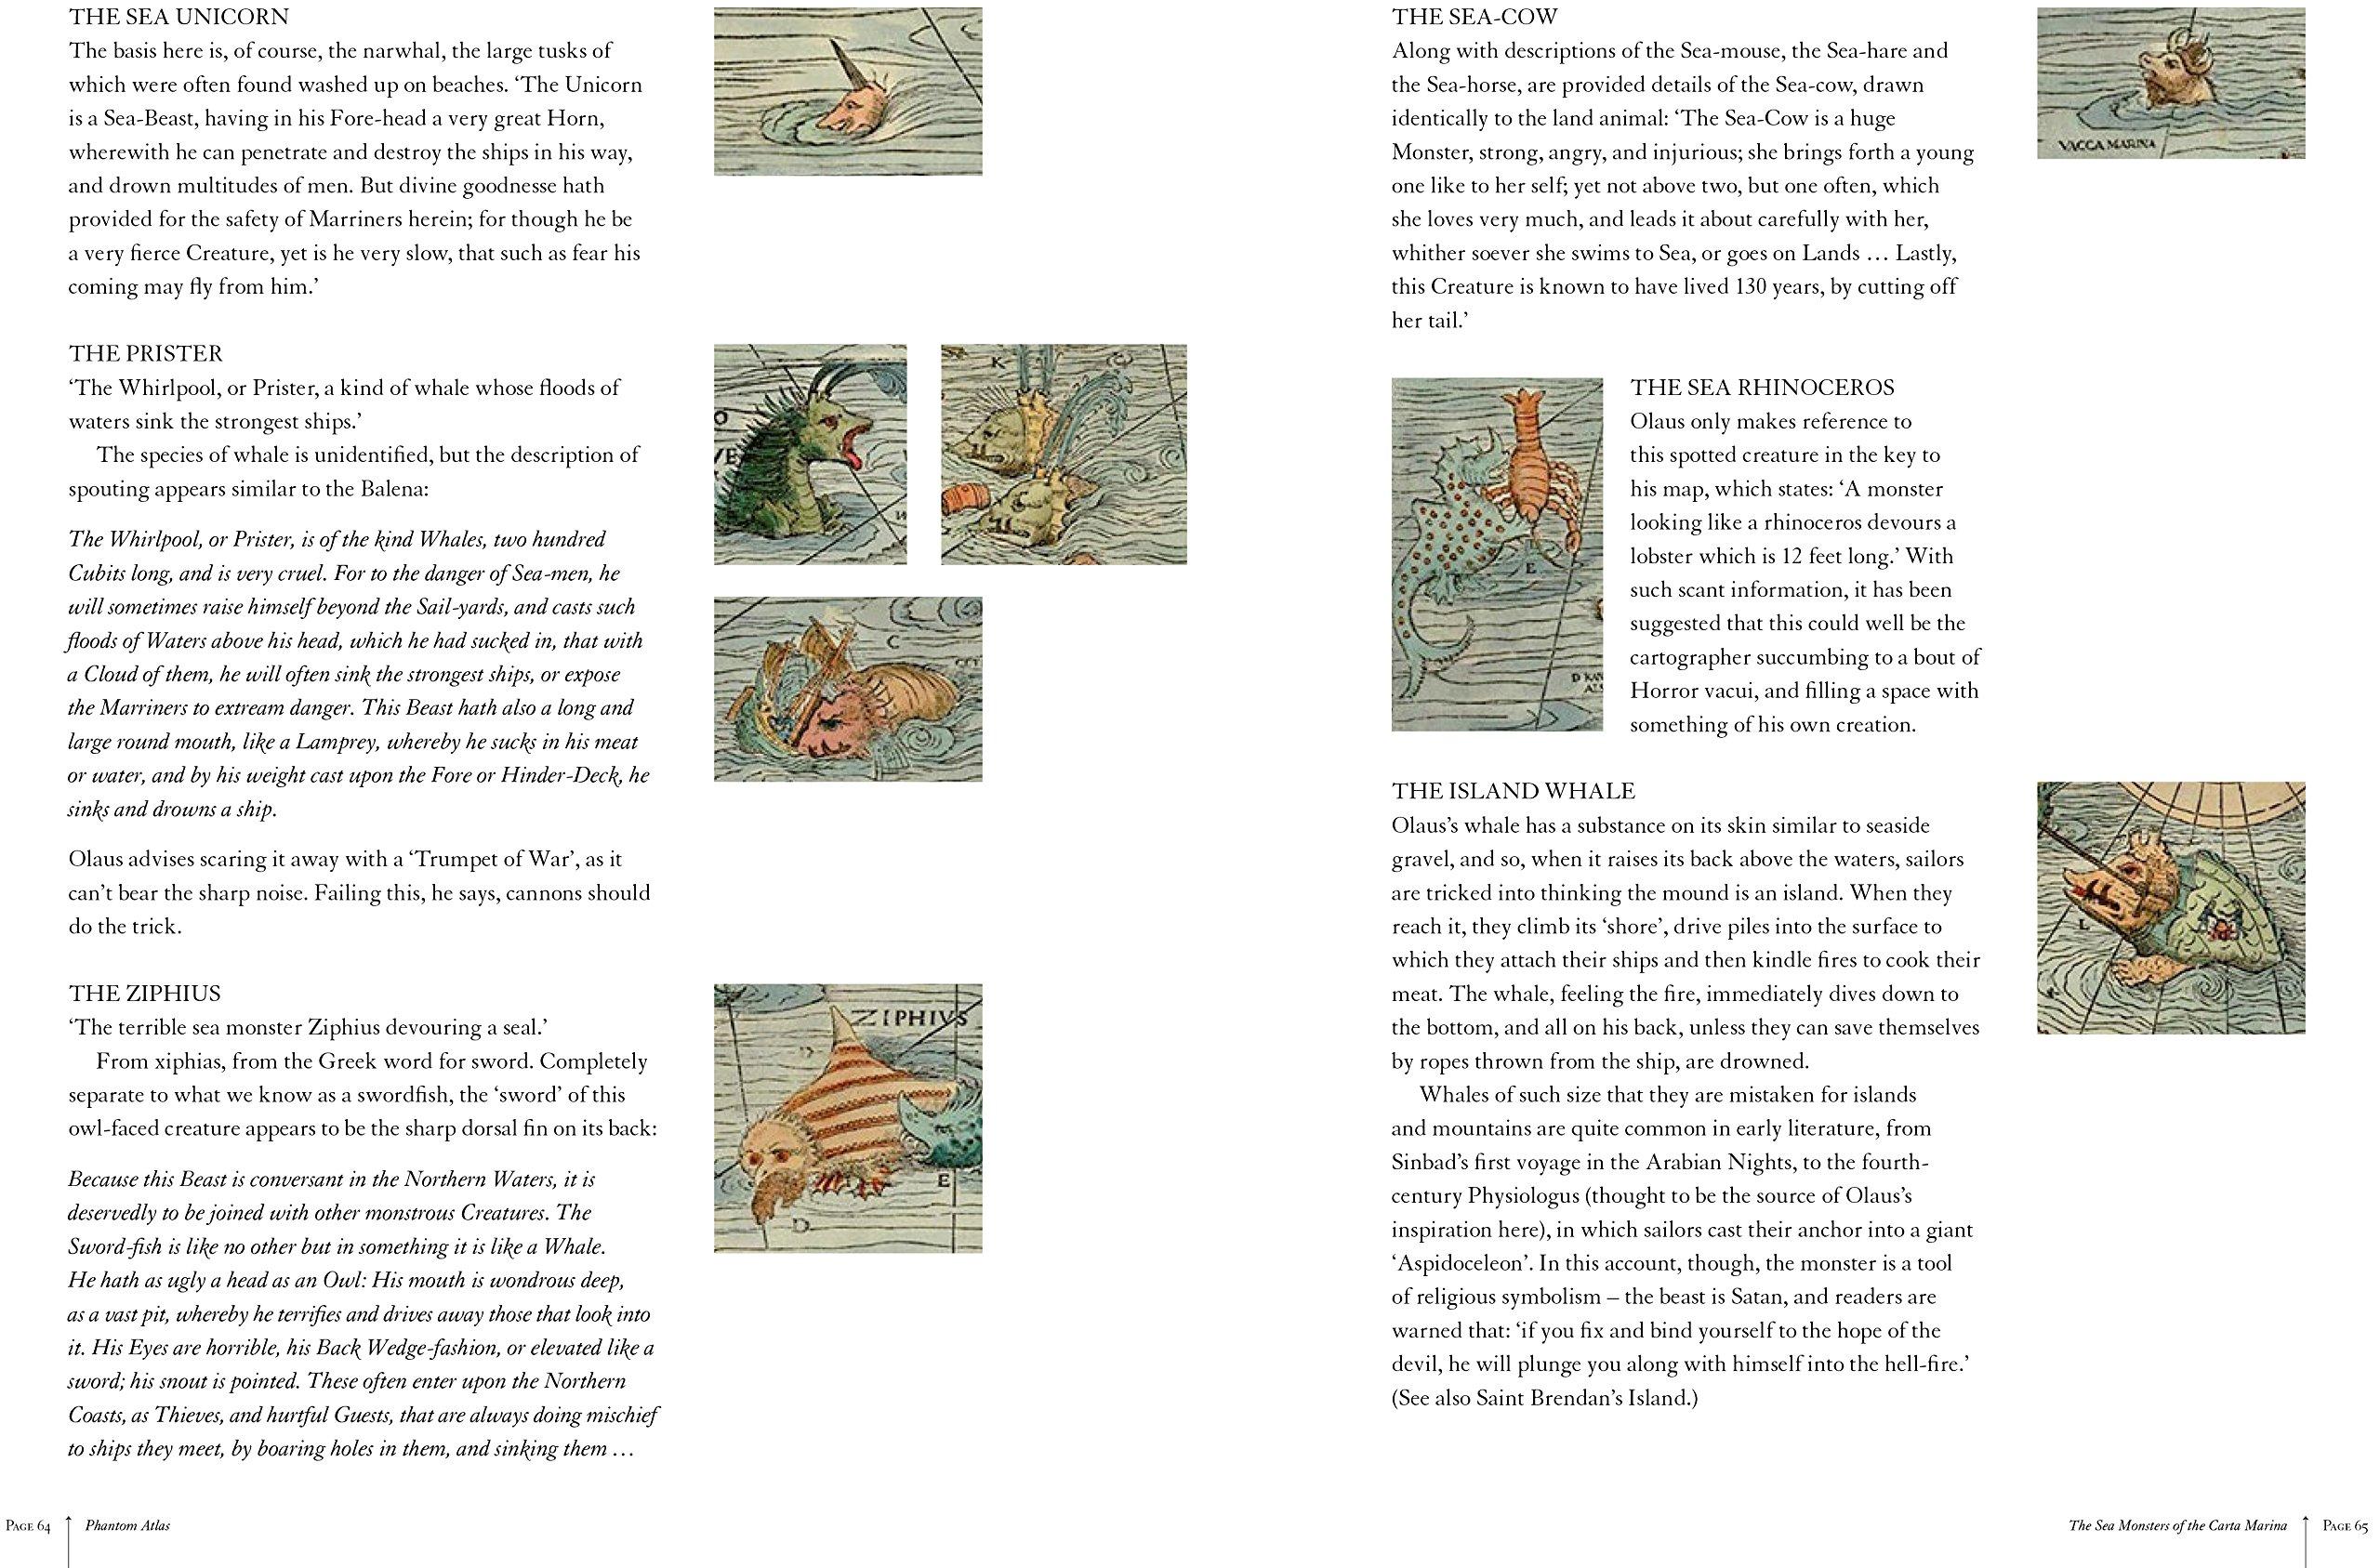 The Phantom Atlas: The Greatest Myths, Lies and Blunders on